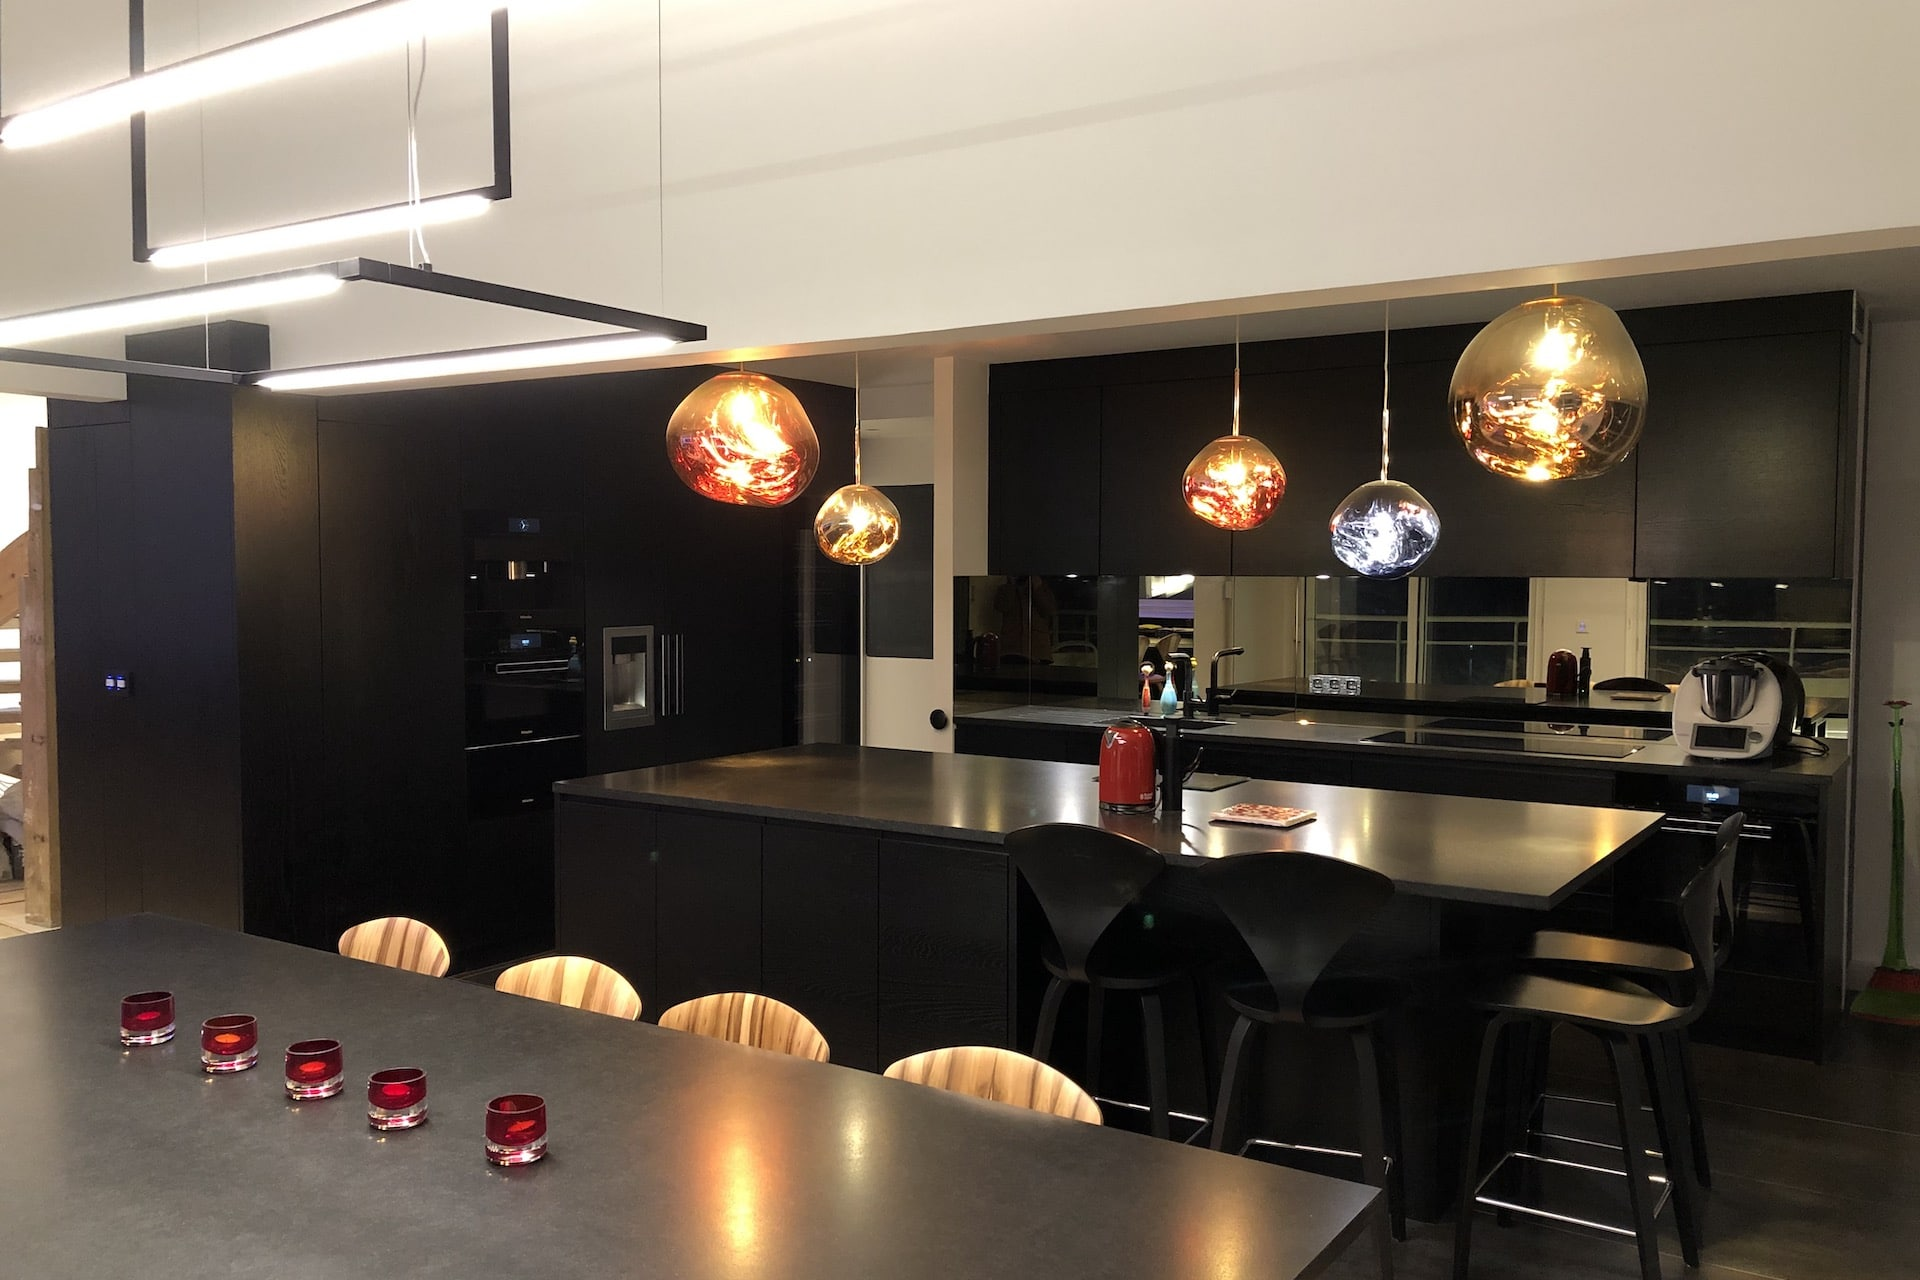 Cuisine Grosliere 1 par Alvarez Cuisines Cuisiniste designer dinterieur